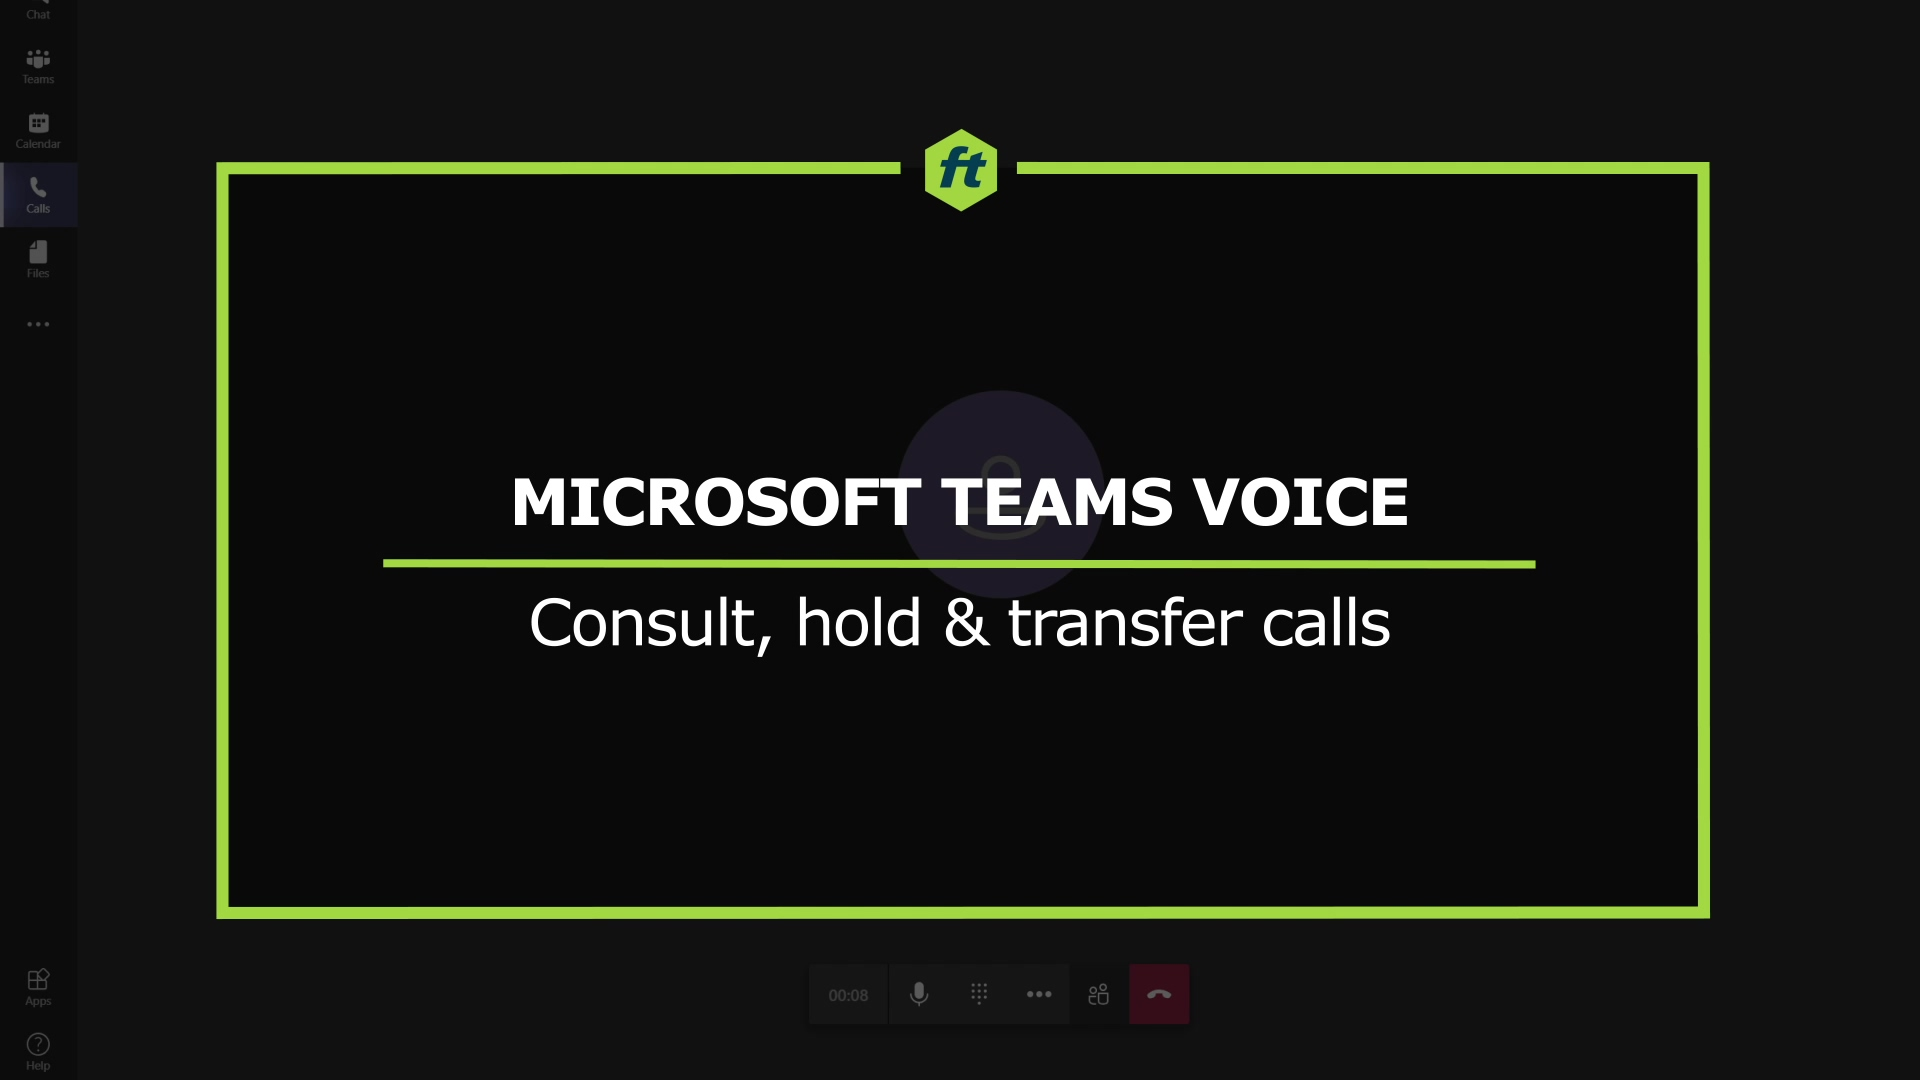 MTV - Consult-hold-transfer